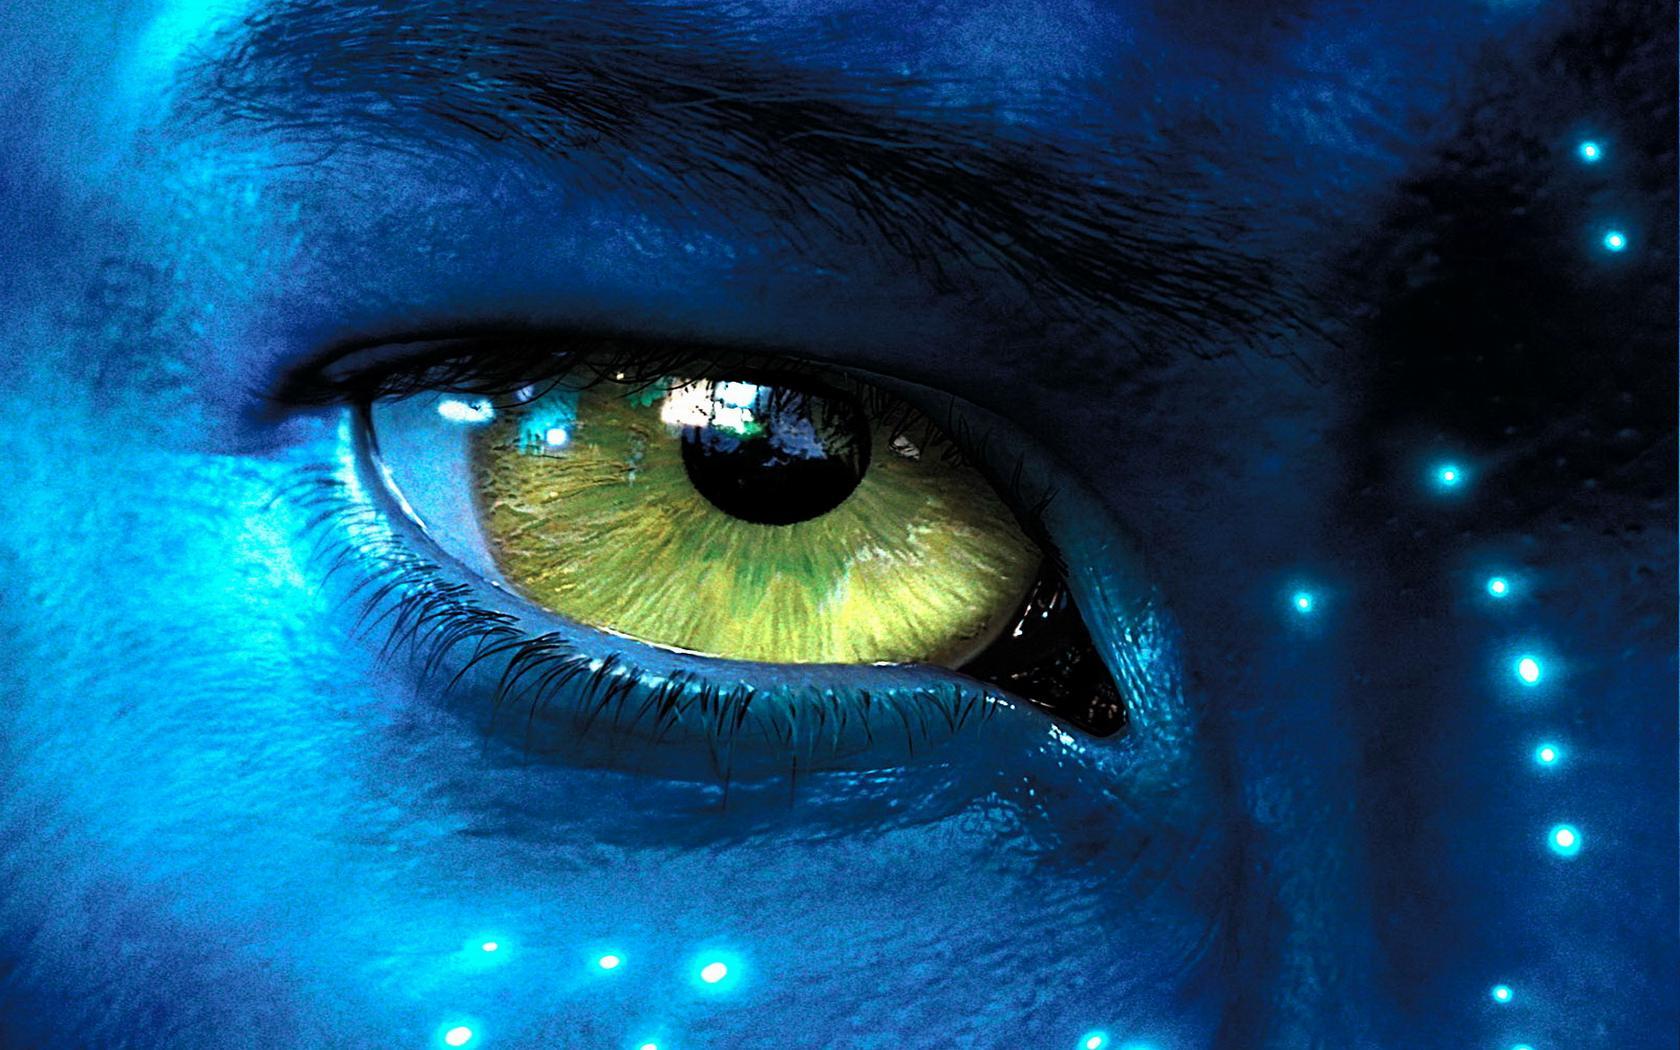 Premiéra Star Wars v Máji 2017 nebude! Môže za to Avatar 2!